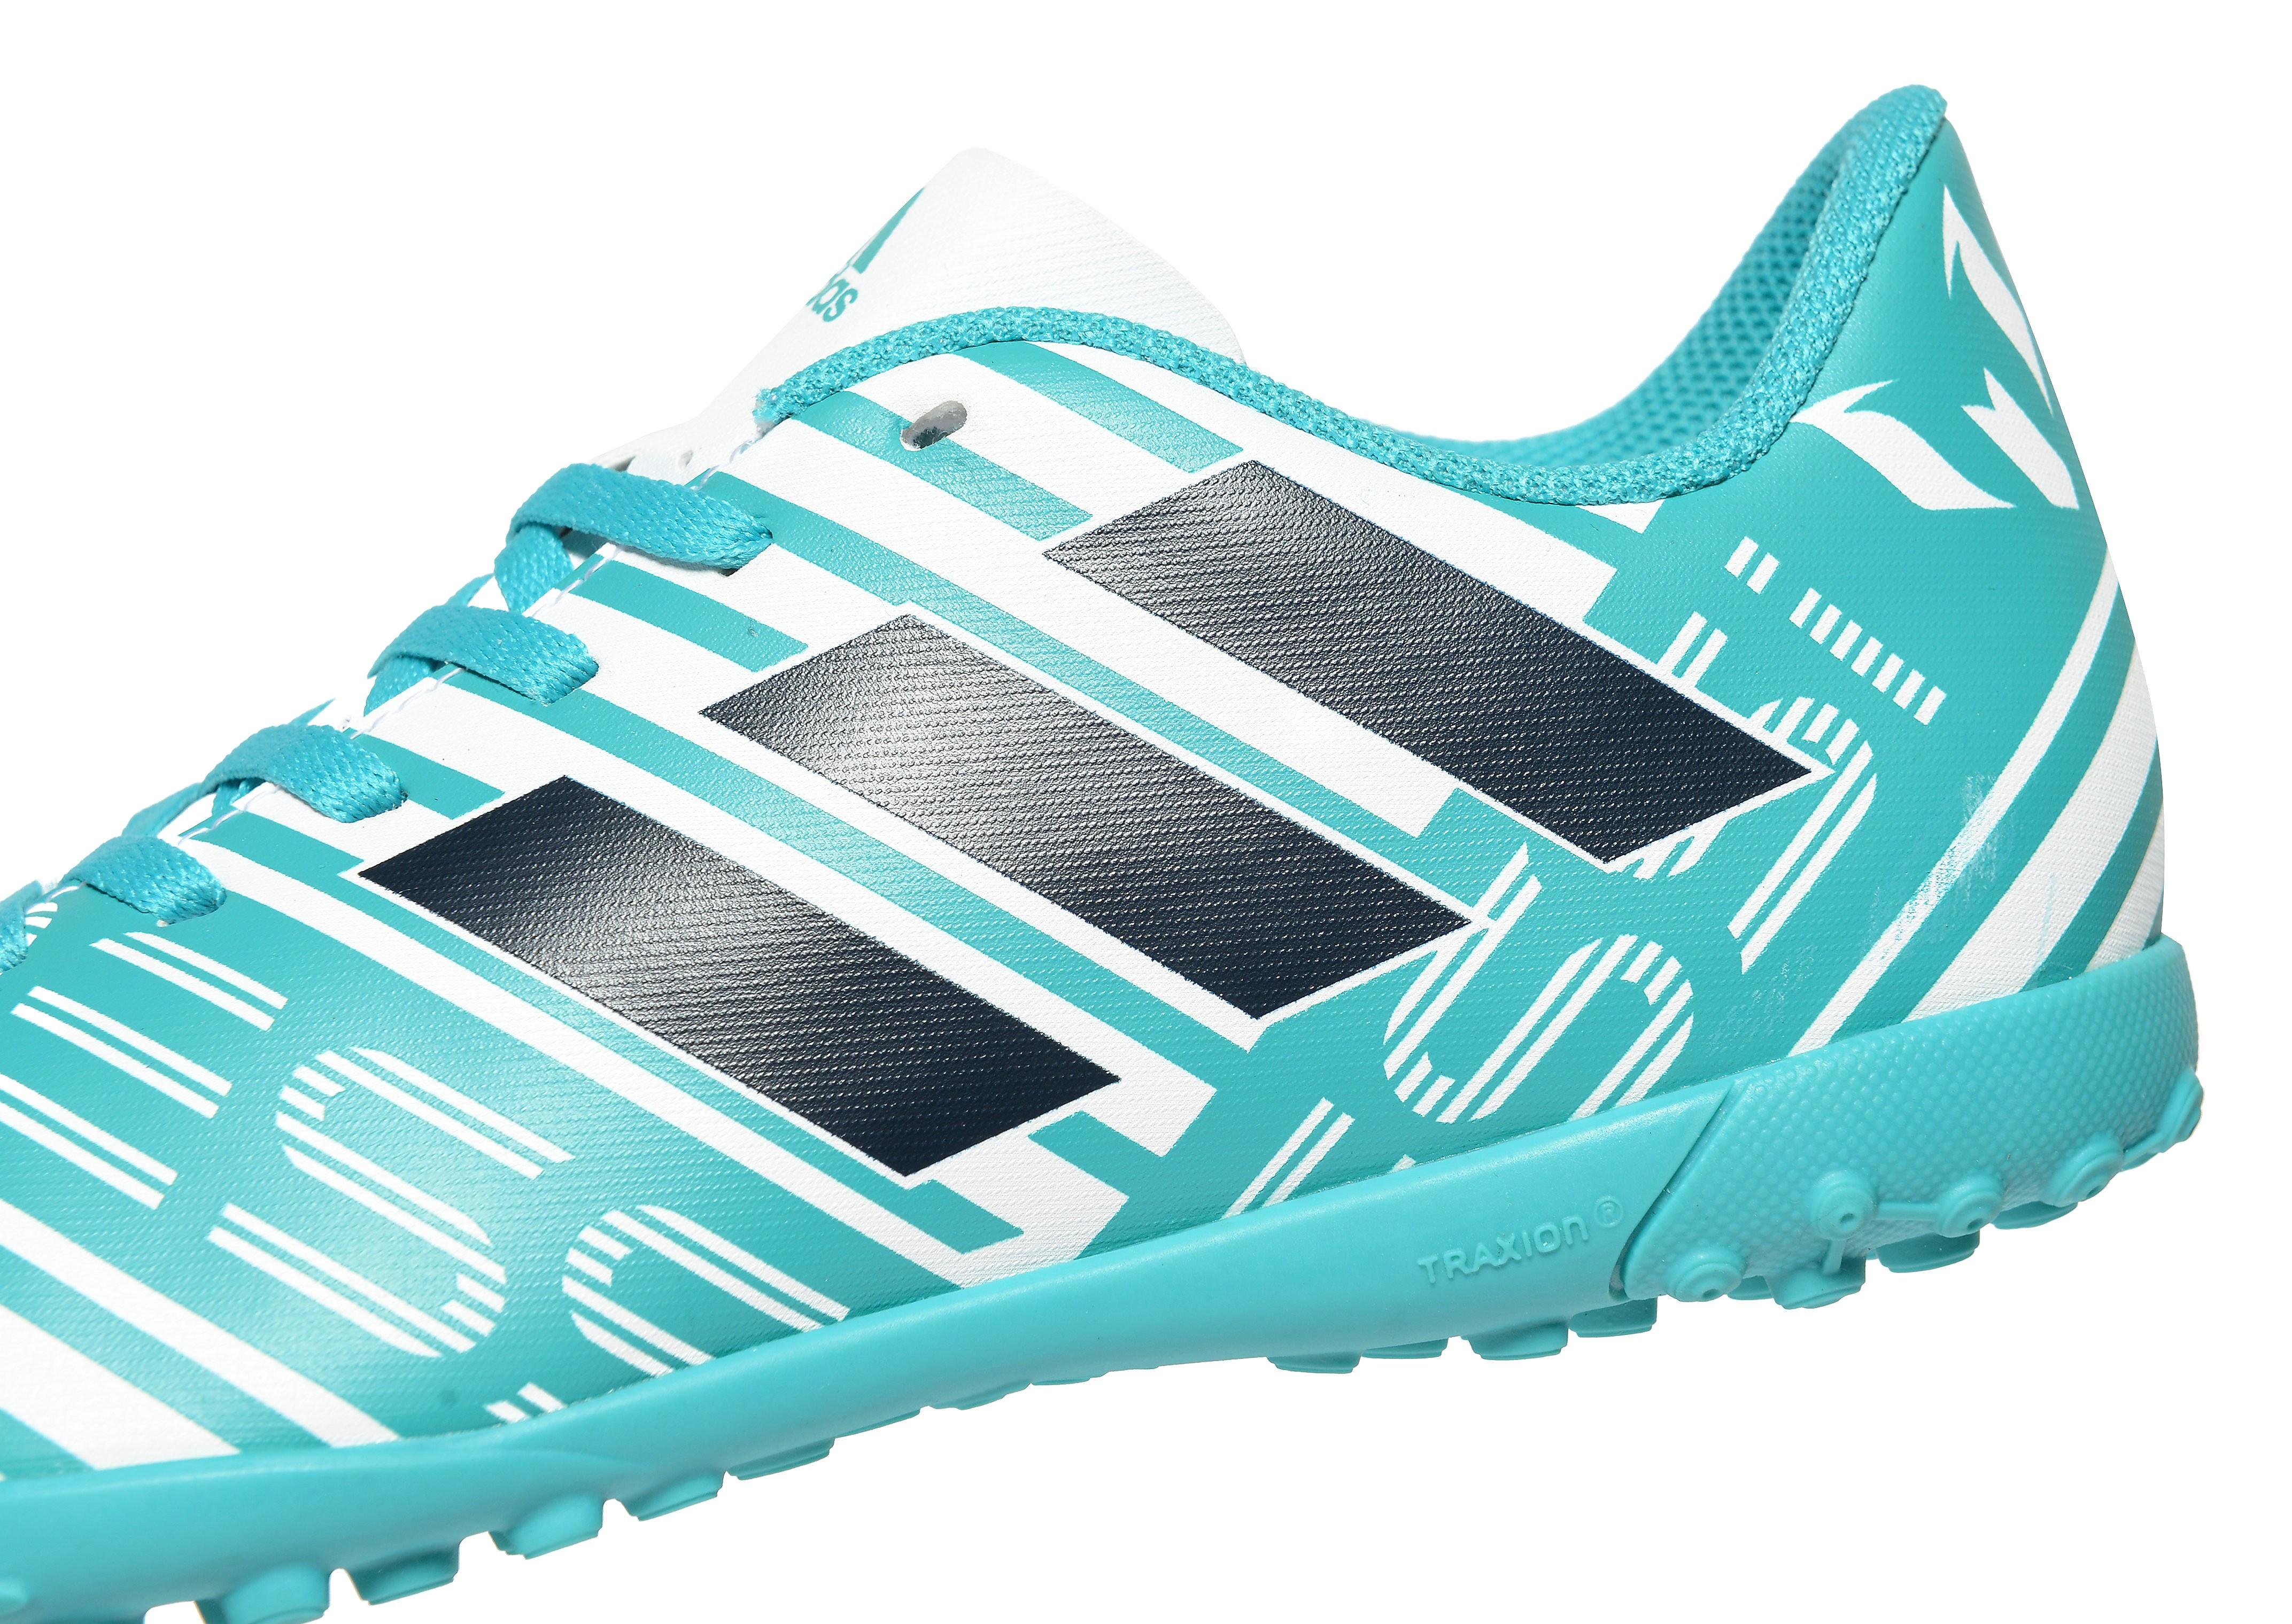 adidas Ocean Storm Nemeziz 17.4 TF Messi Children